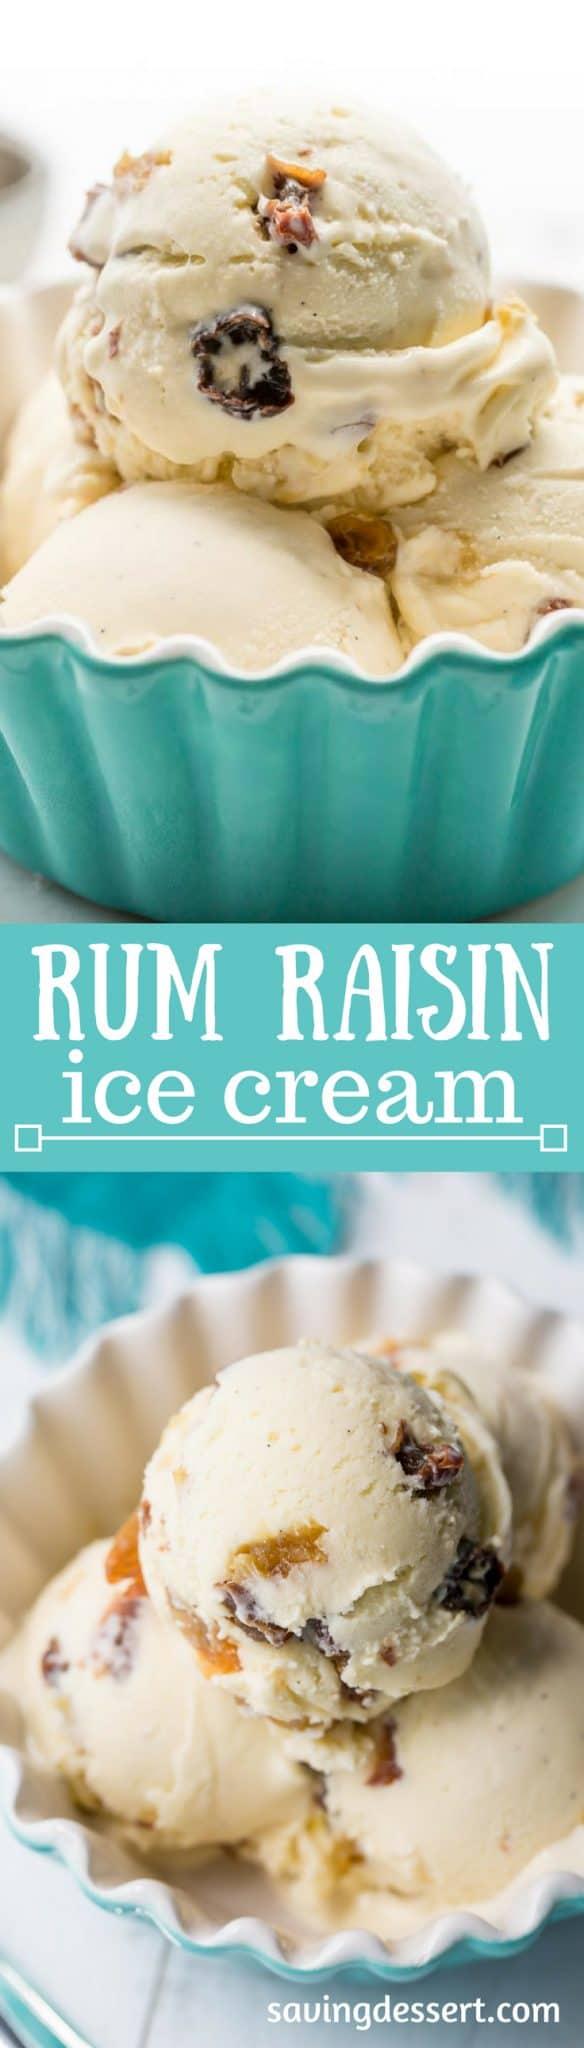 Rum Raisin Ice Cream ~ a classic summer treat with plump, rum soaked raisins and a rich custard base loaded with vanilla beans. www.savingdessert.com